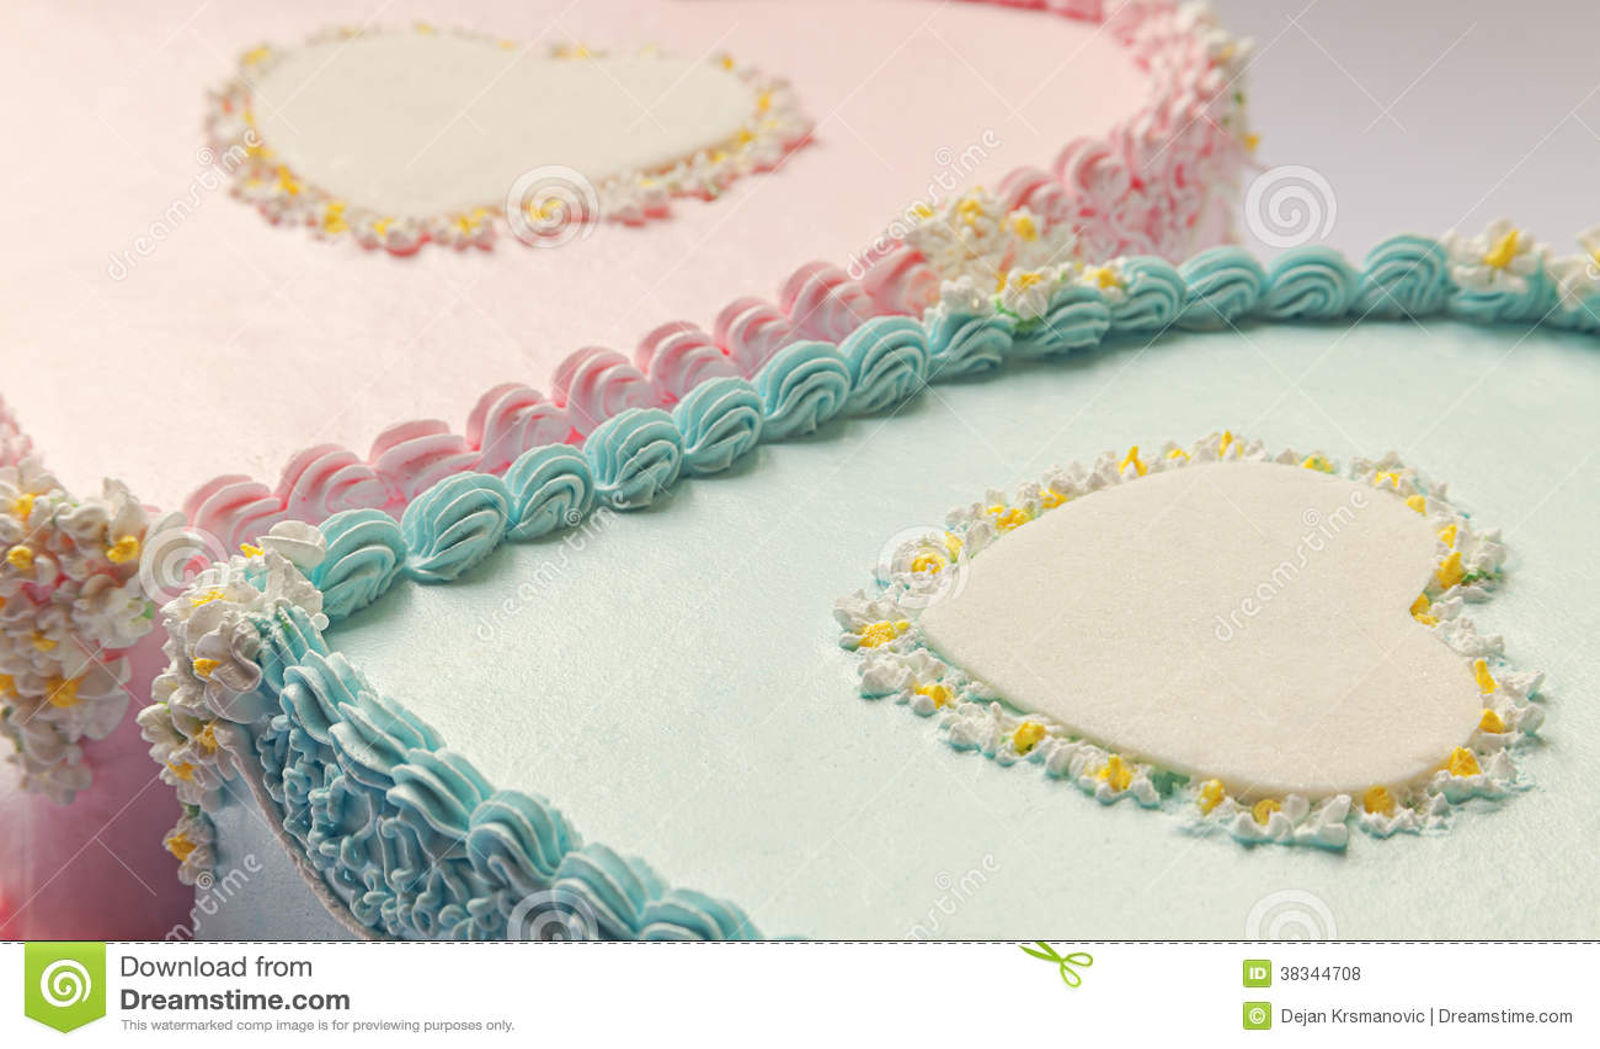 Peachy Birthday Cakes Stock Photo Image Of Plate Pink Style 38344708 Funny Birthday Cards Online Inifodamsfinfo